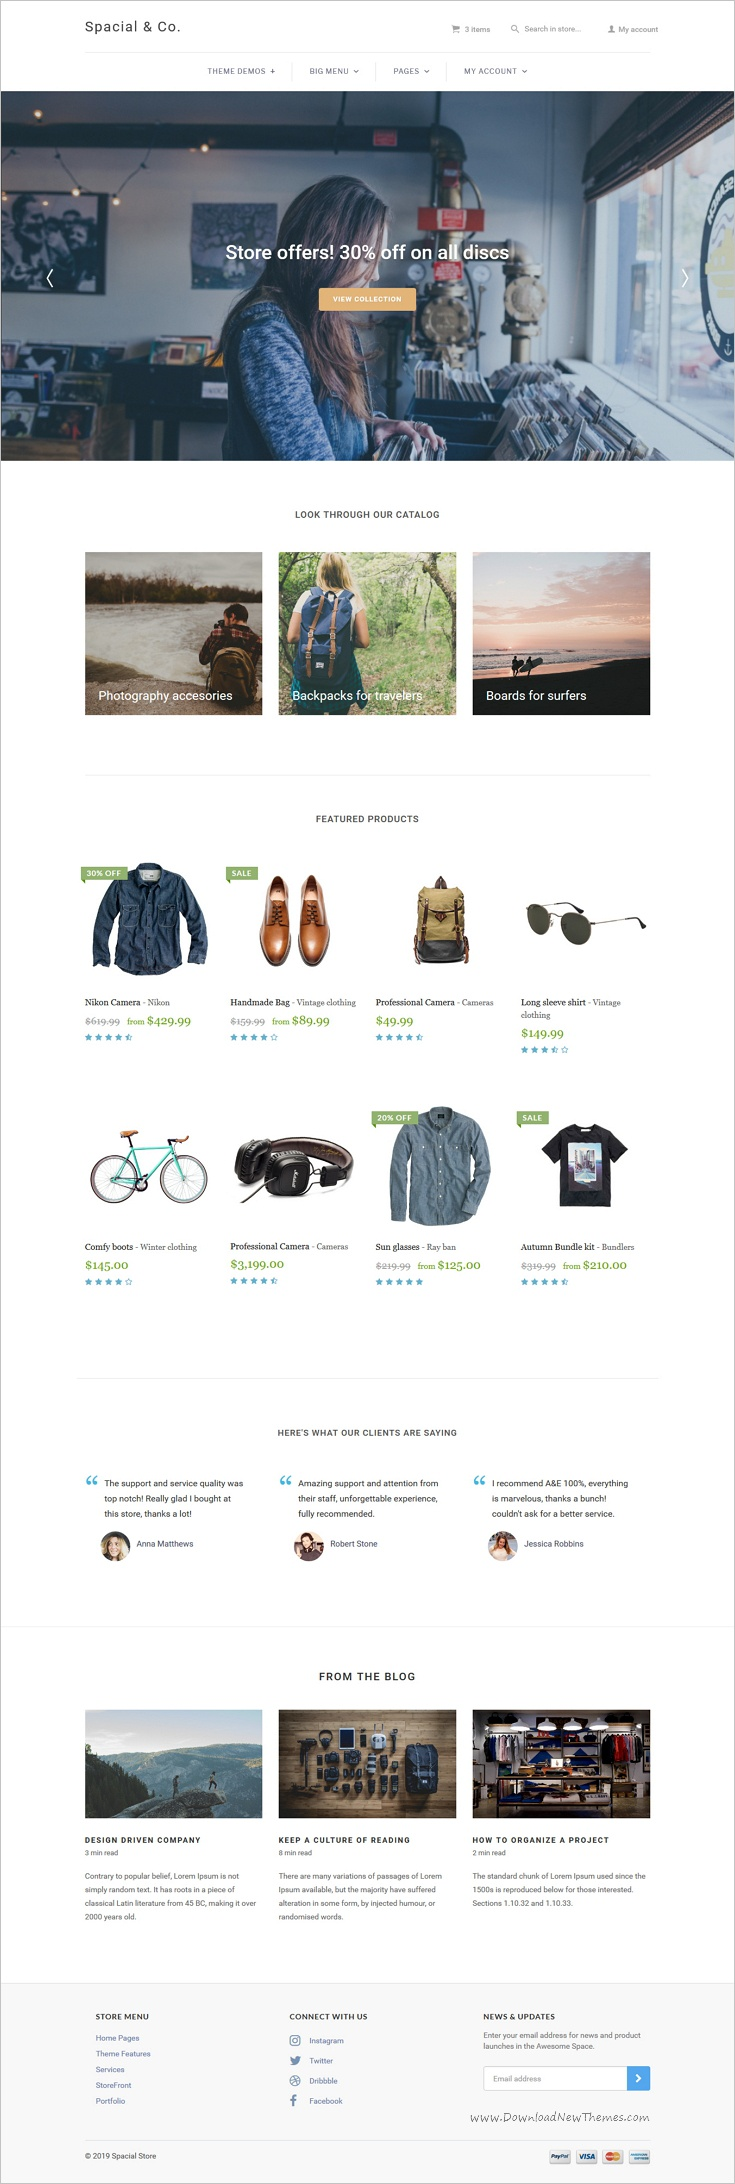 Spacial Responsive Bootstrap 4 Theme Fashion Web Design Ecommerce Web Design Web Design